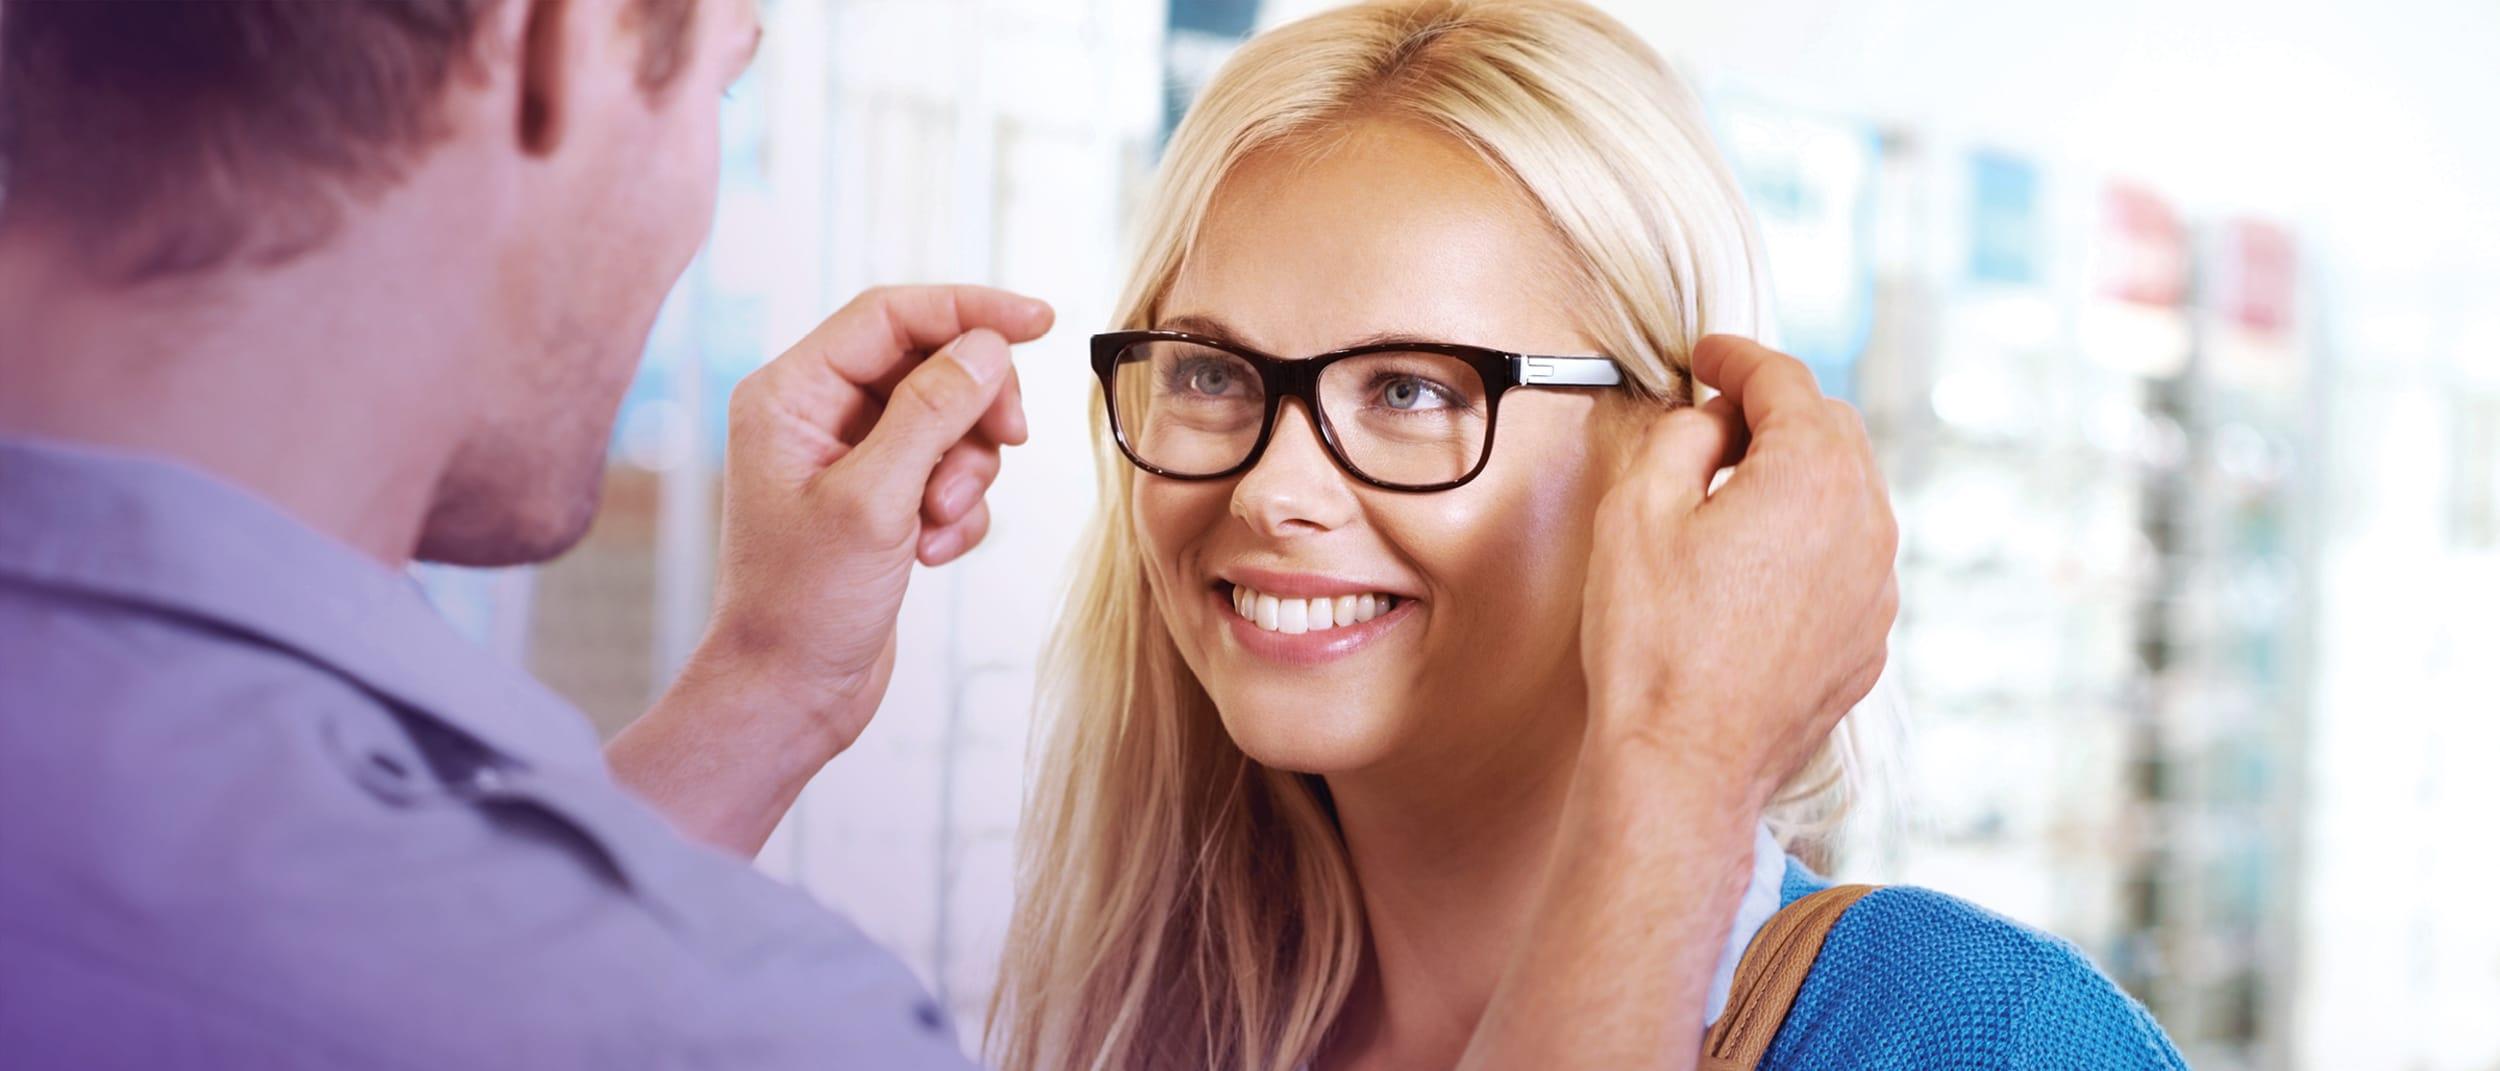 Laubman & Pank Optometrists know your eyes